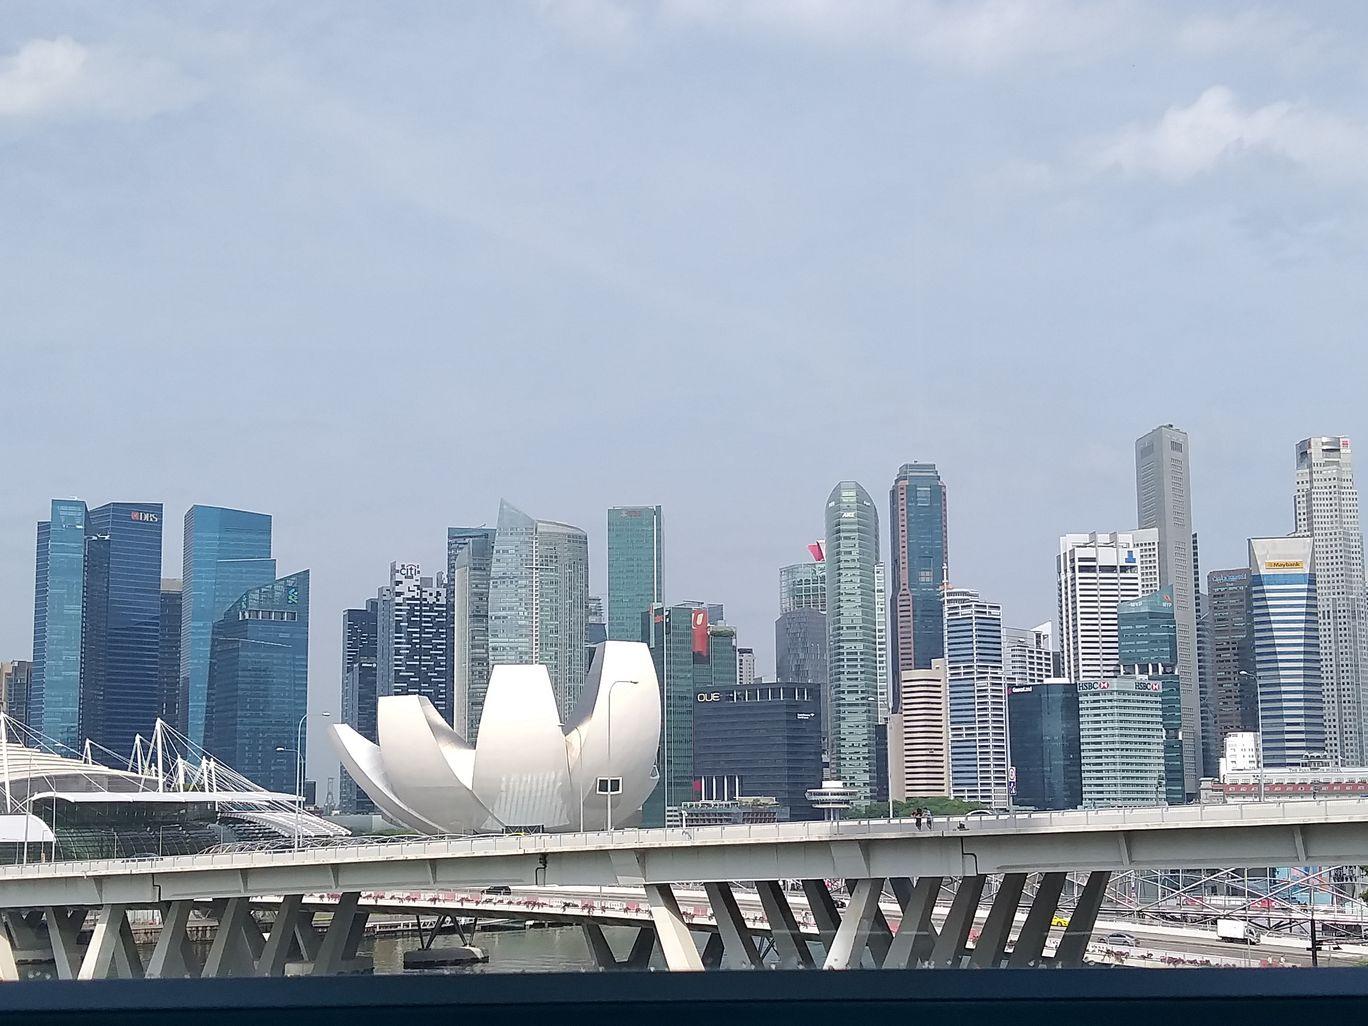 Photo of Singapore By Pummy Shyam